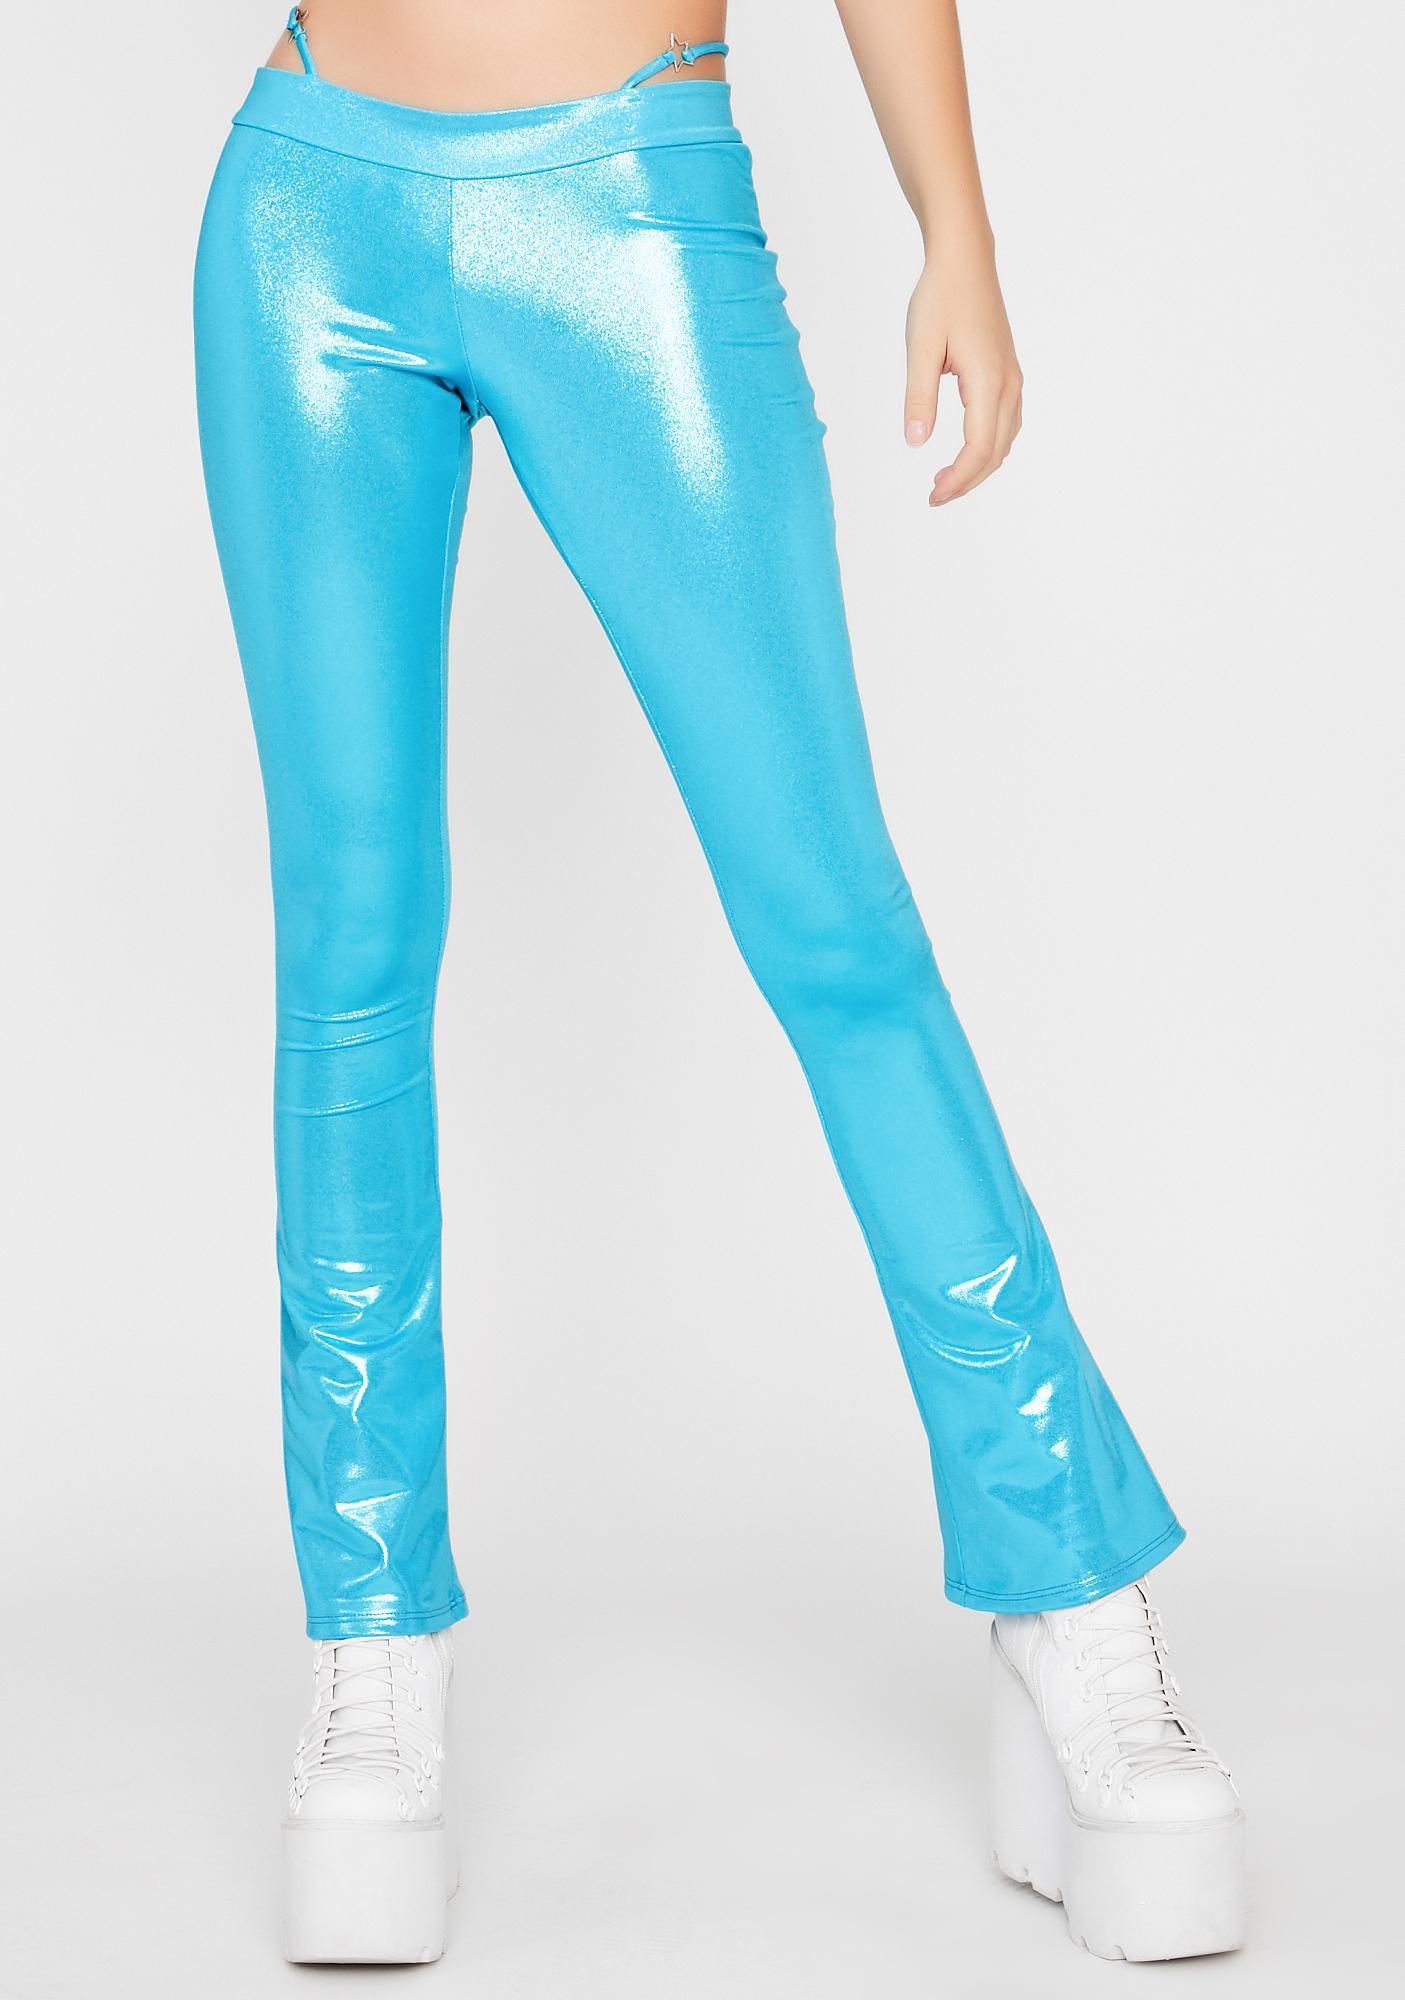 Aqua Nuclear Waves G-String Pants